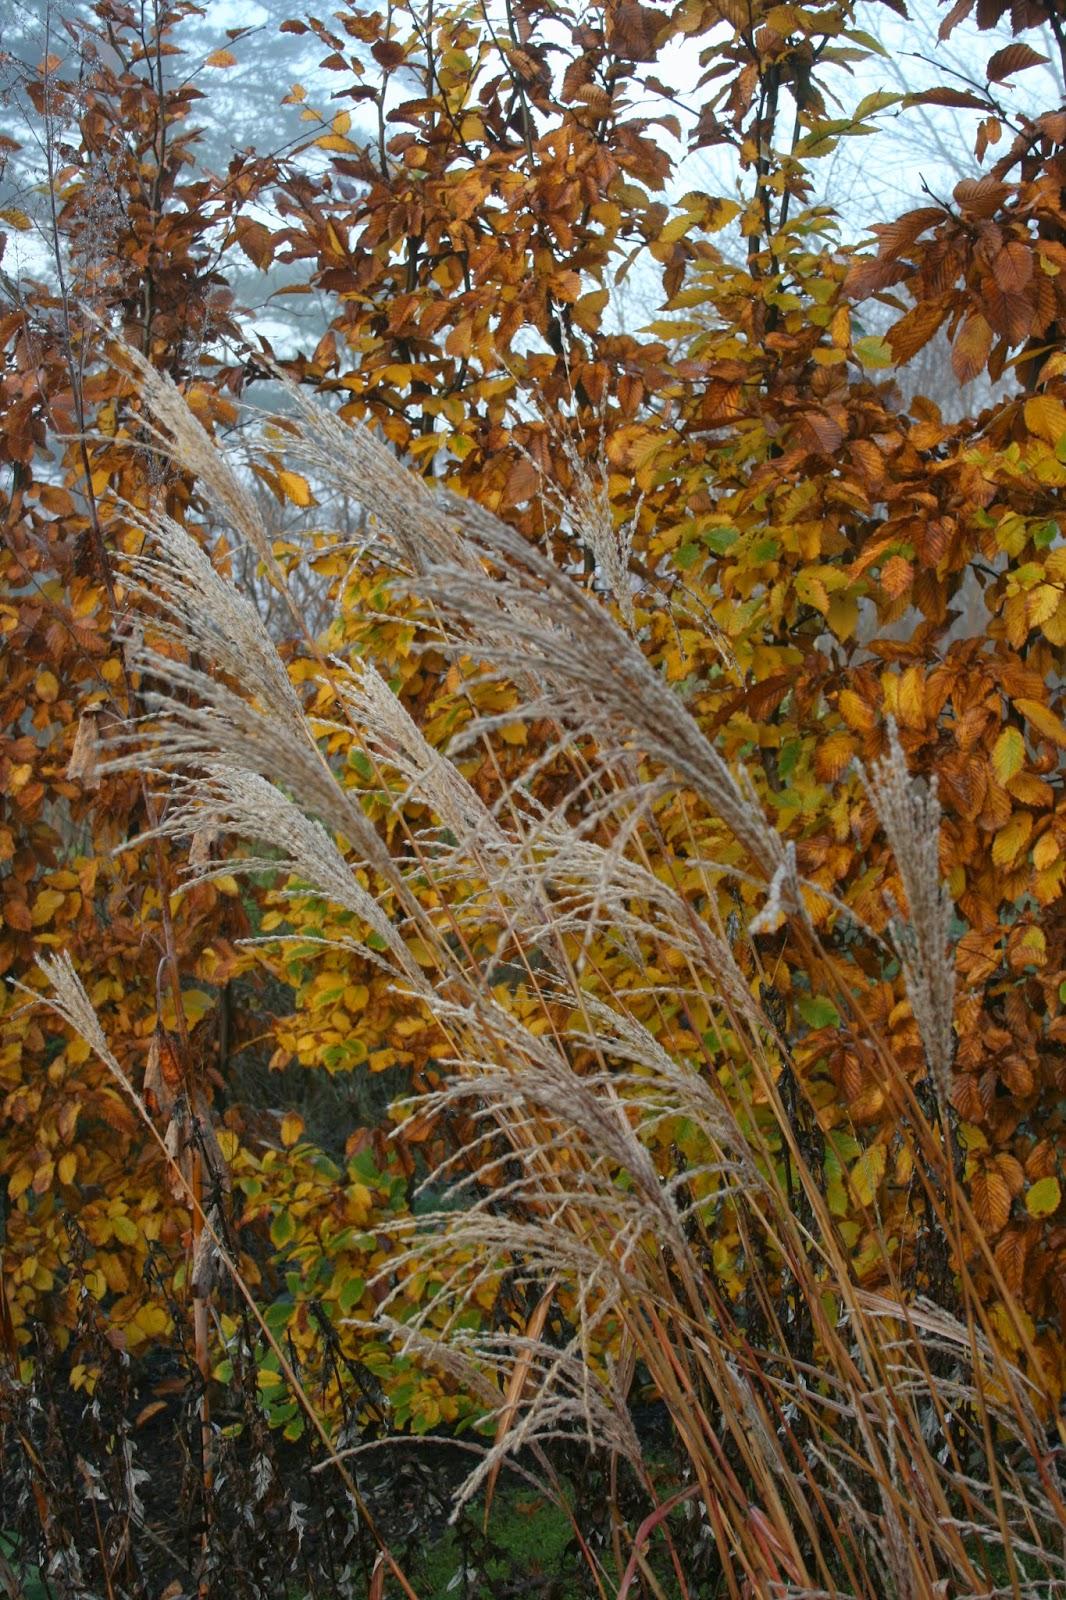 Japanskt gräs Miscanthus sinensis